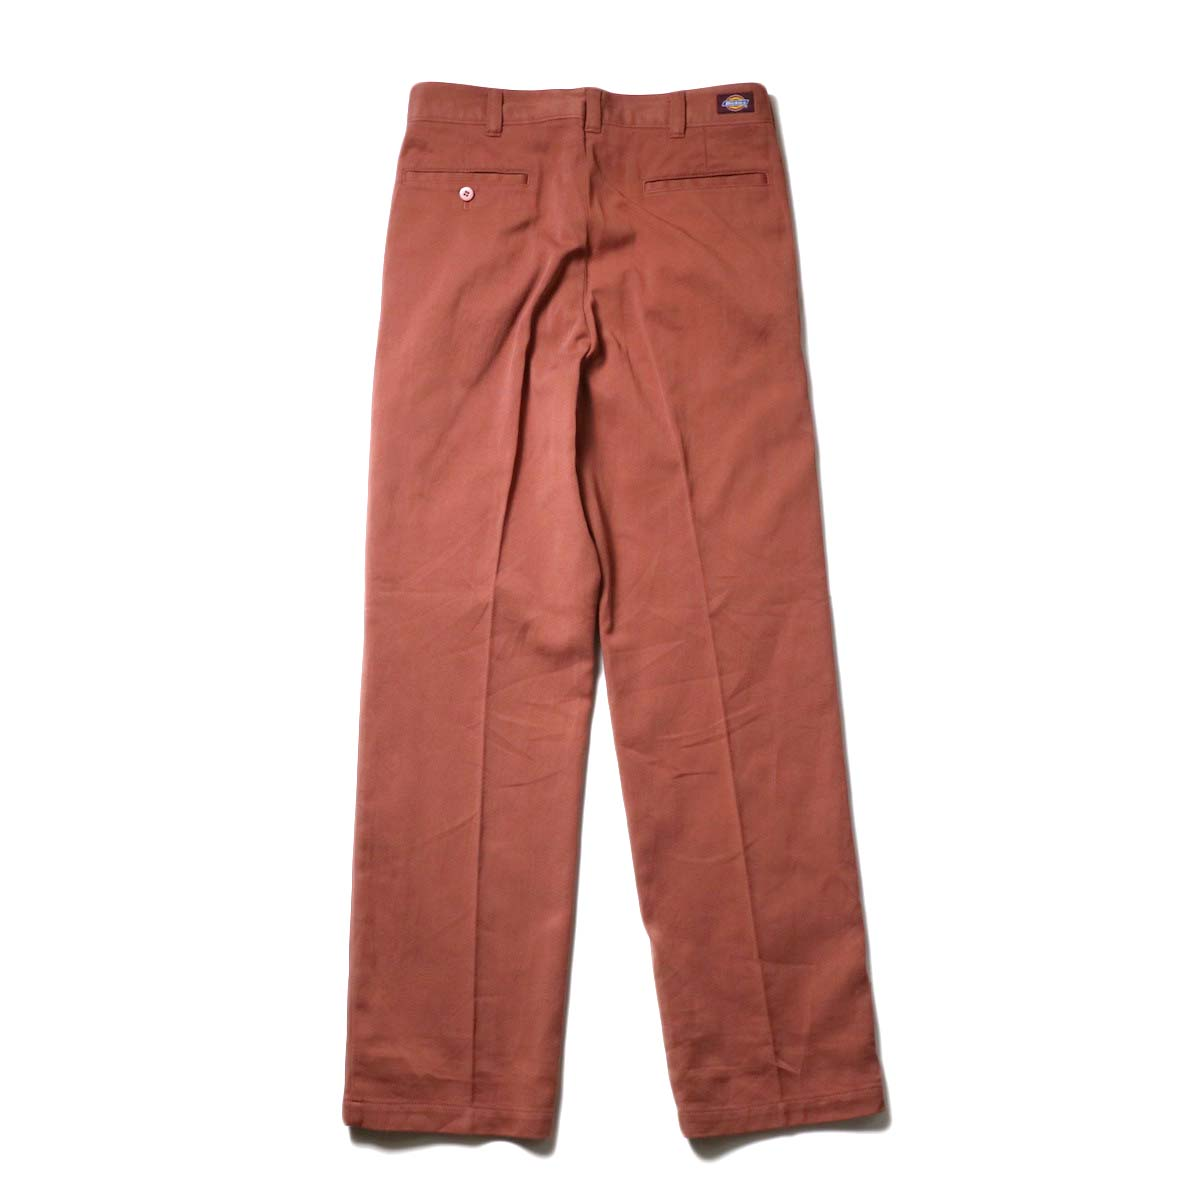 UNUSED × Dickies / UW0939 Cotton Linen Trousers (Orange)  背面